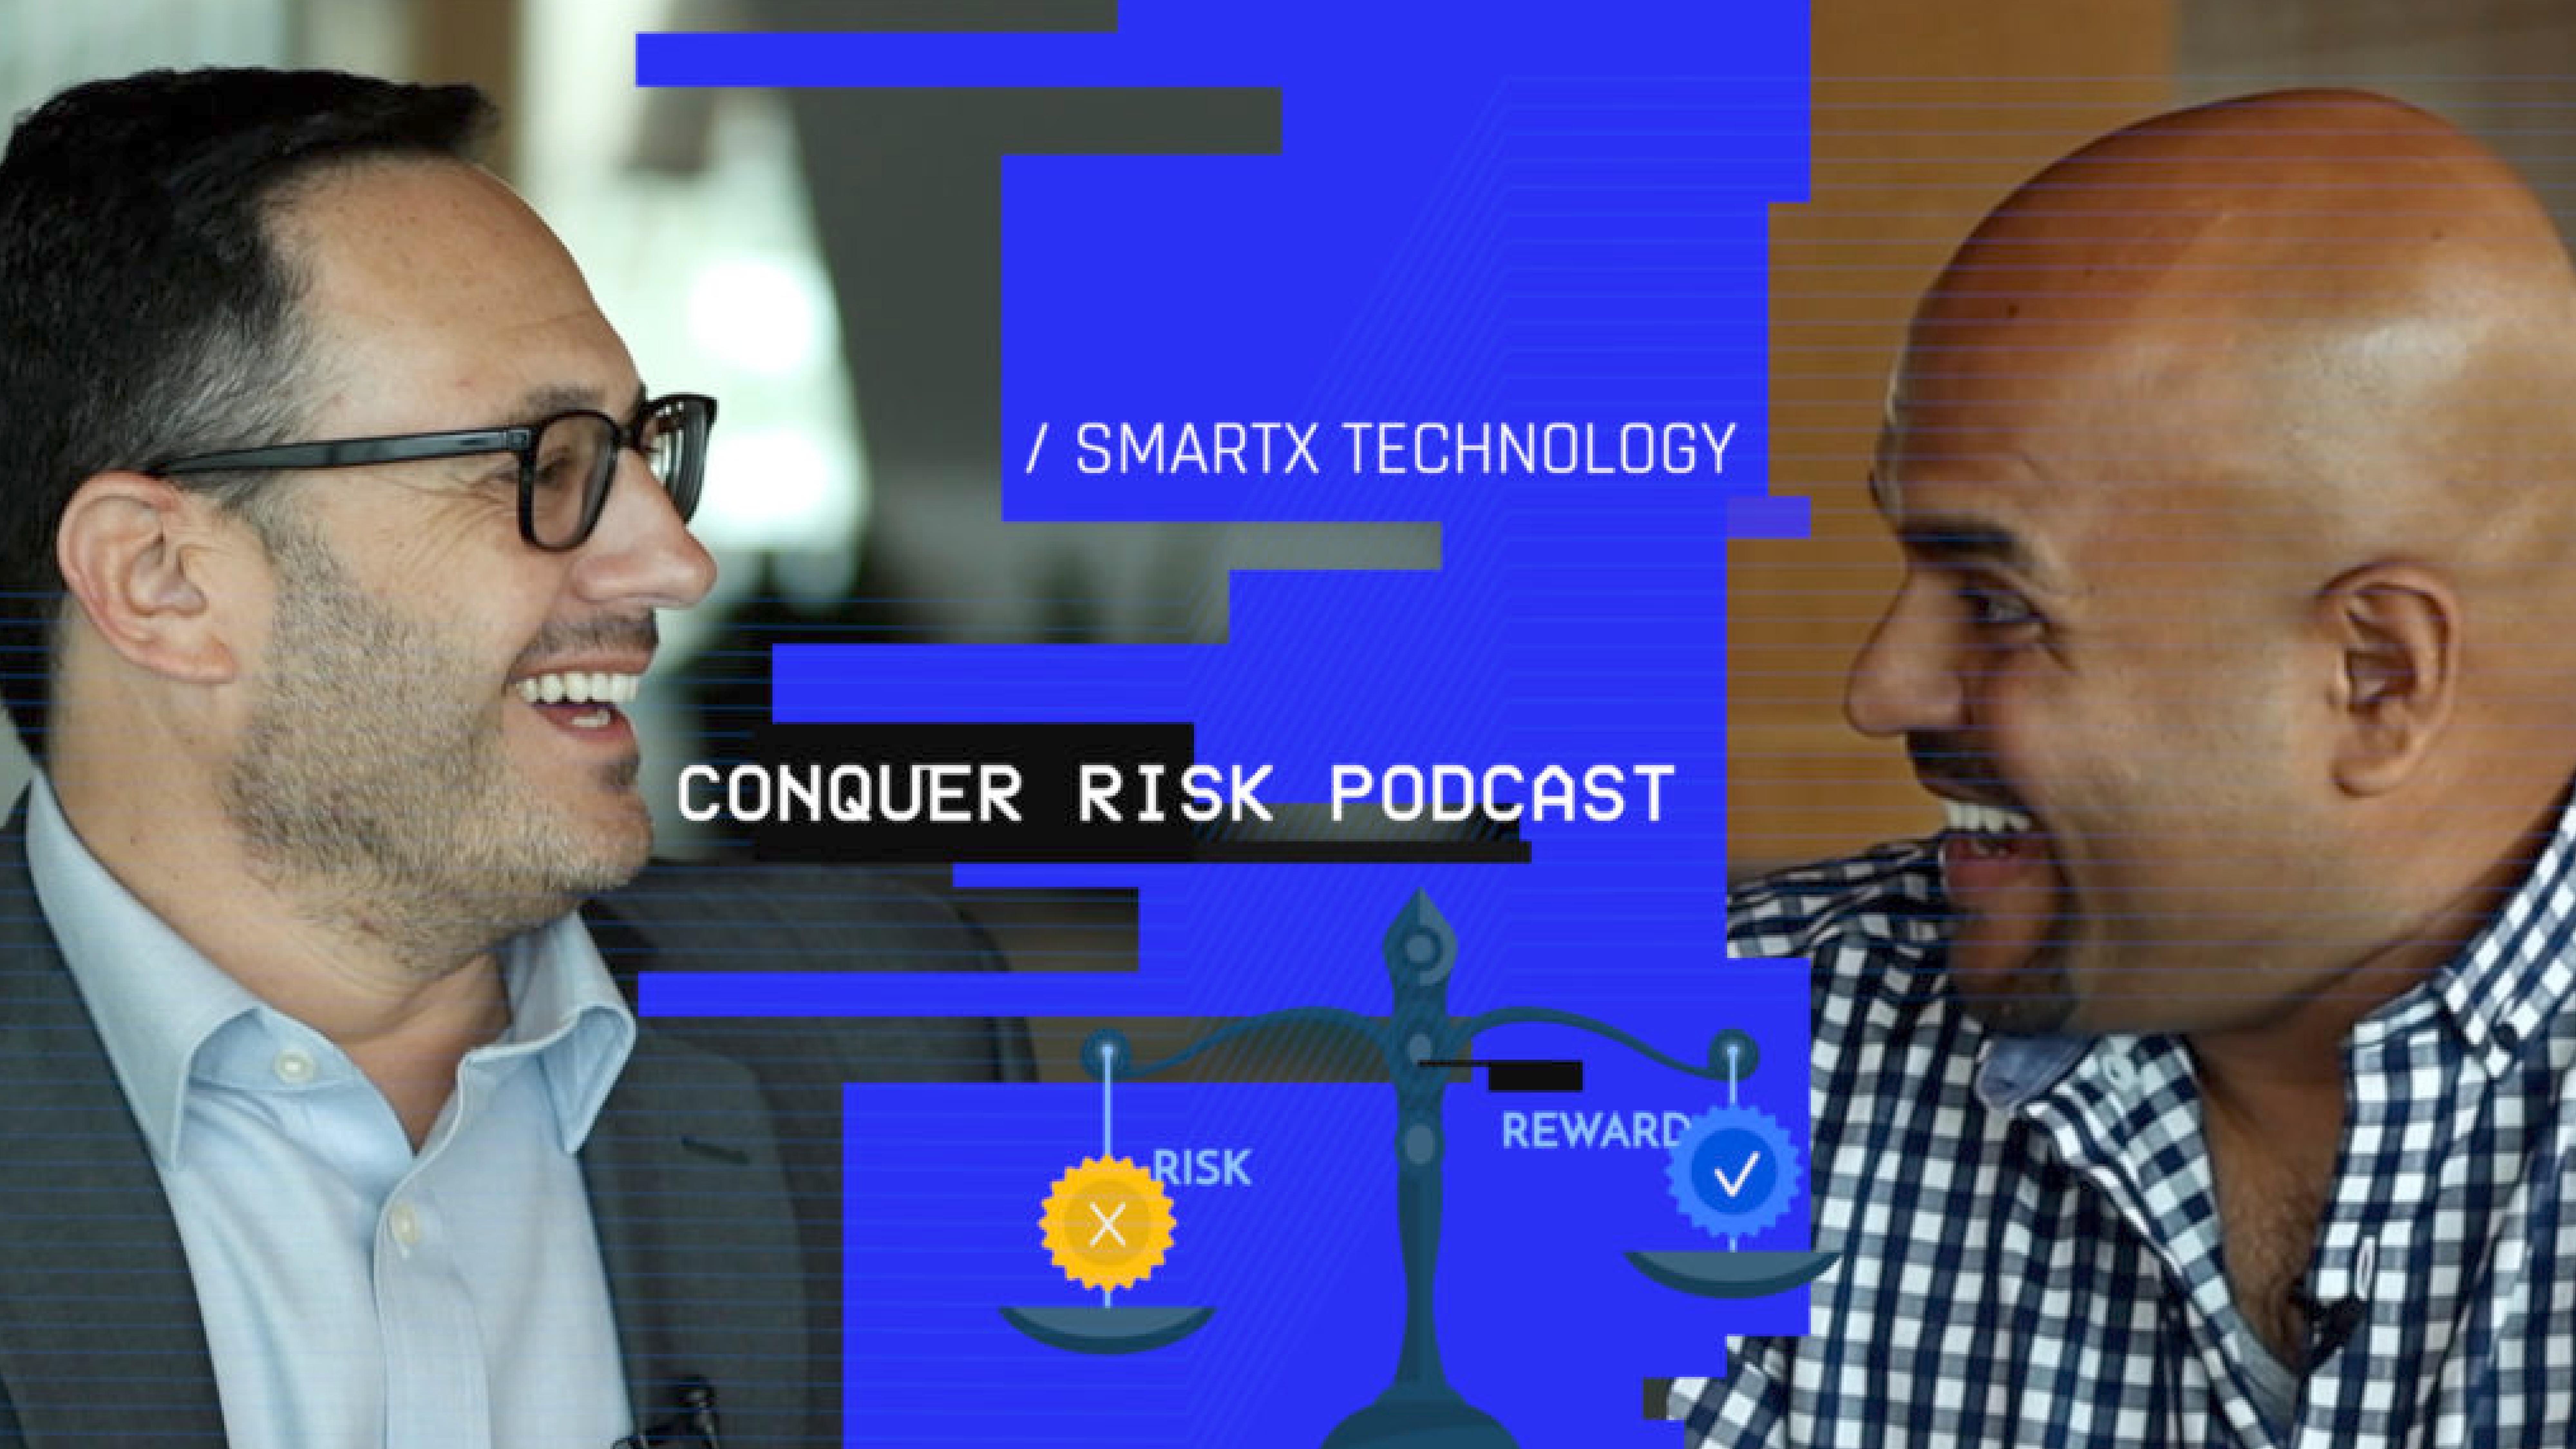 SMArtX Technology (S2 E11)